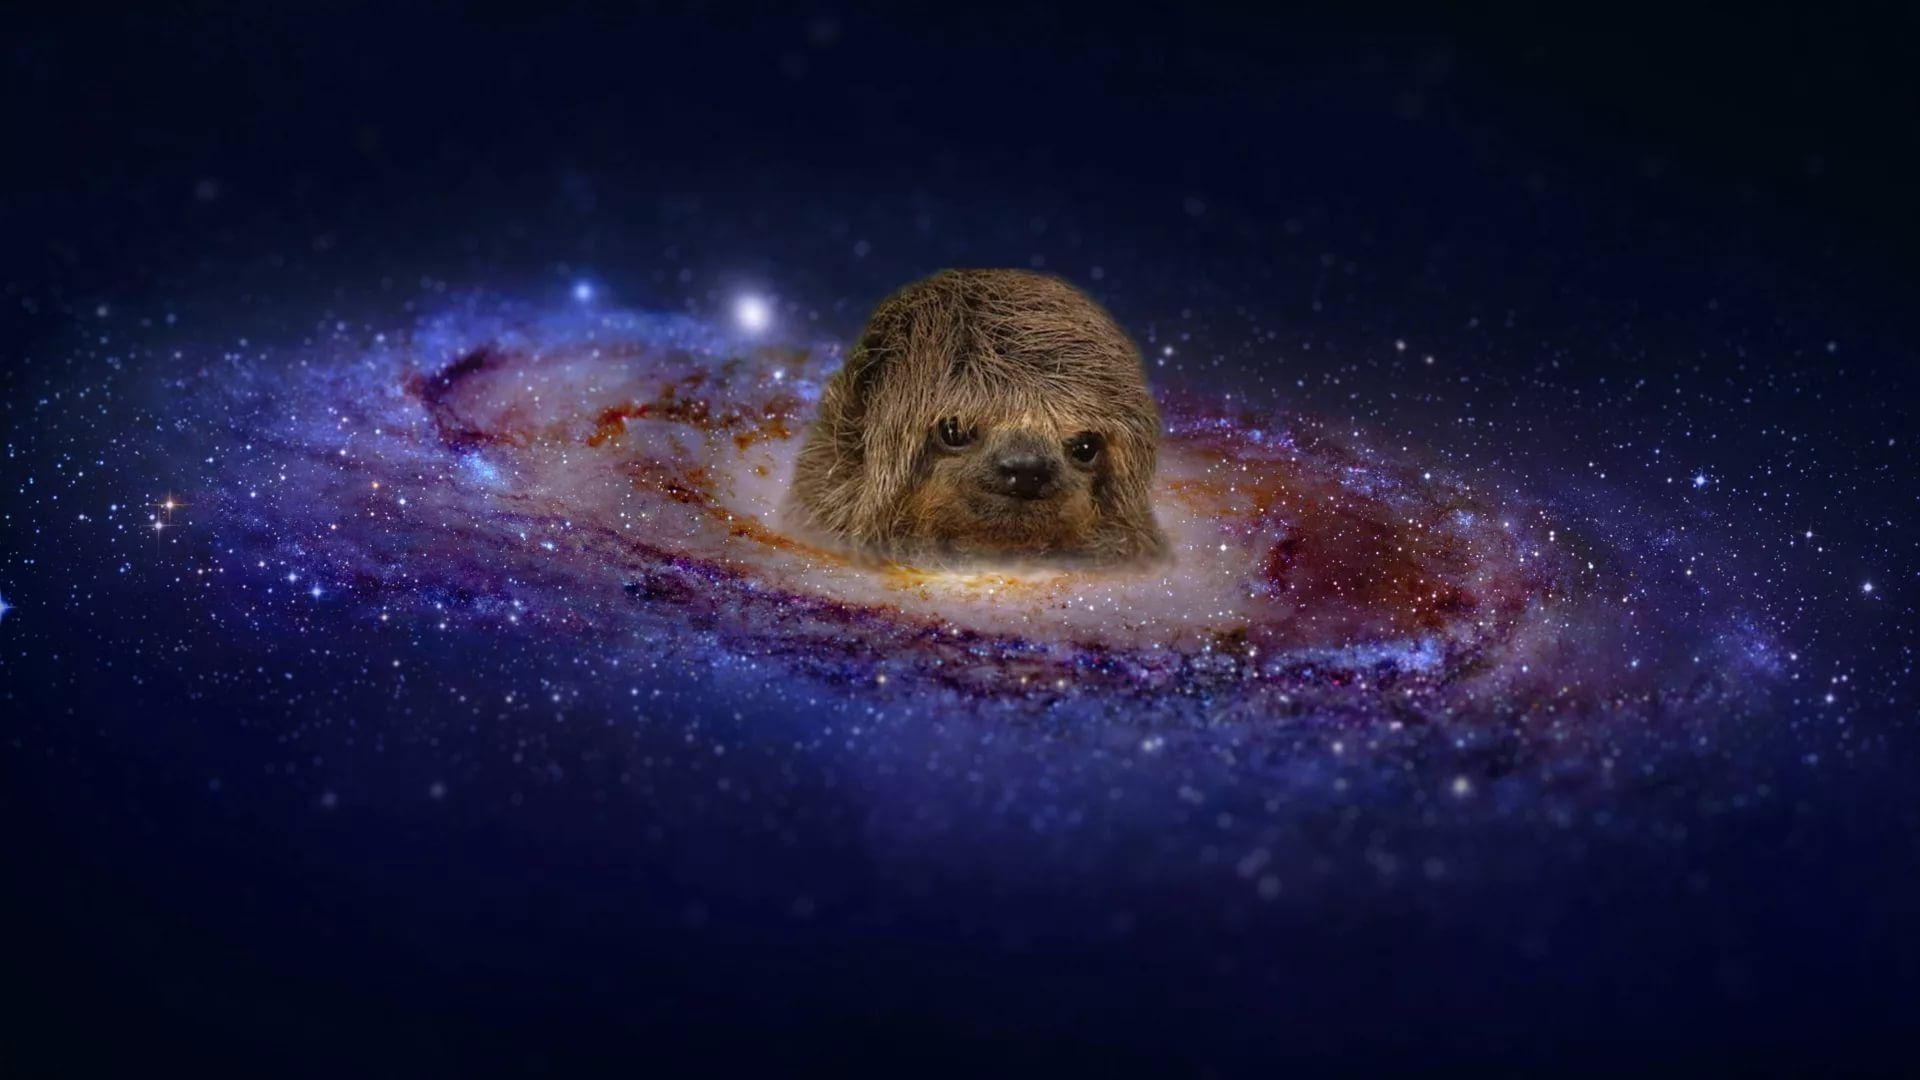 чем предадим картинки животные в космосе композиции